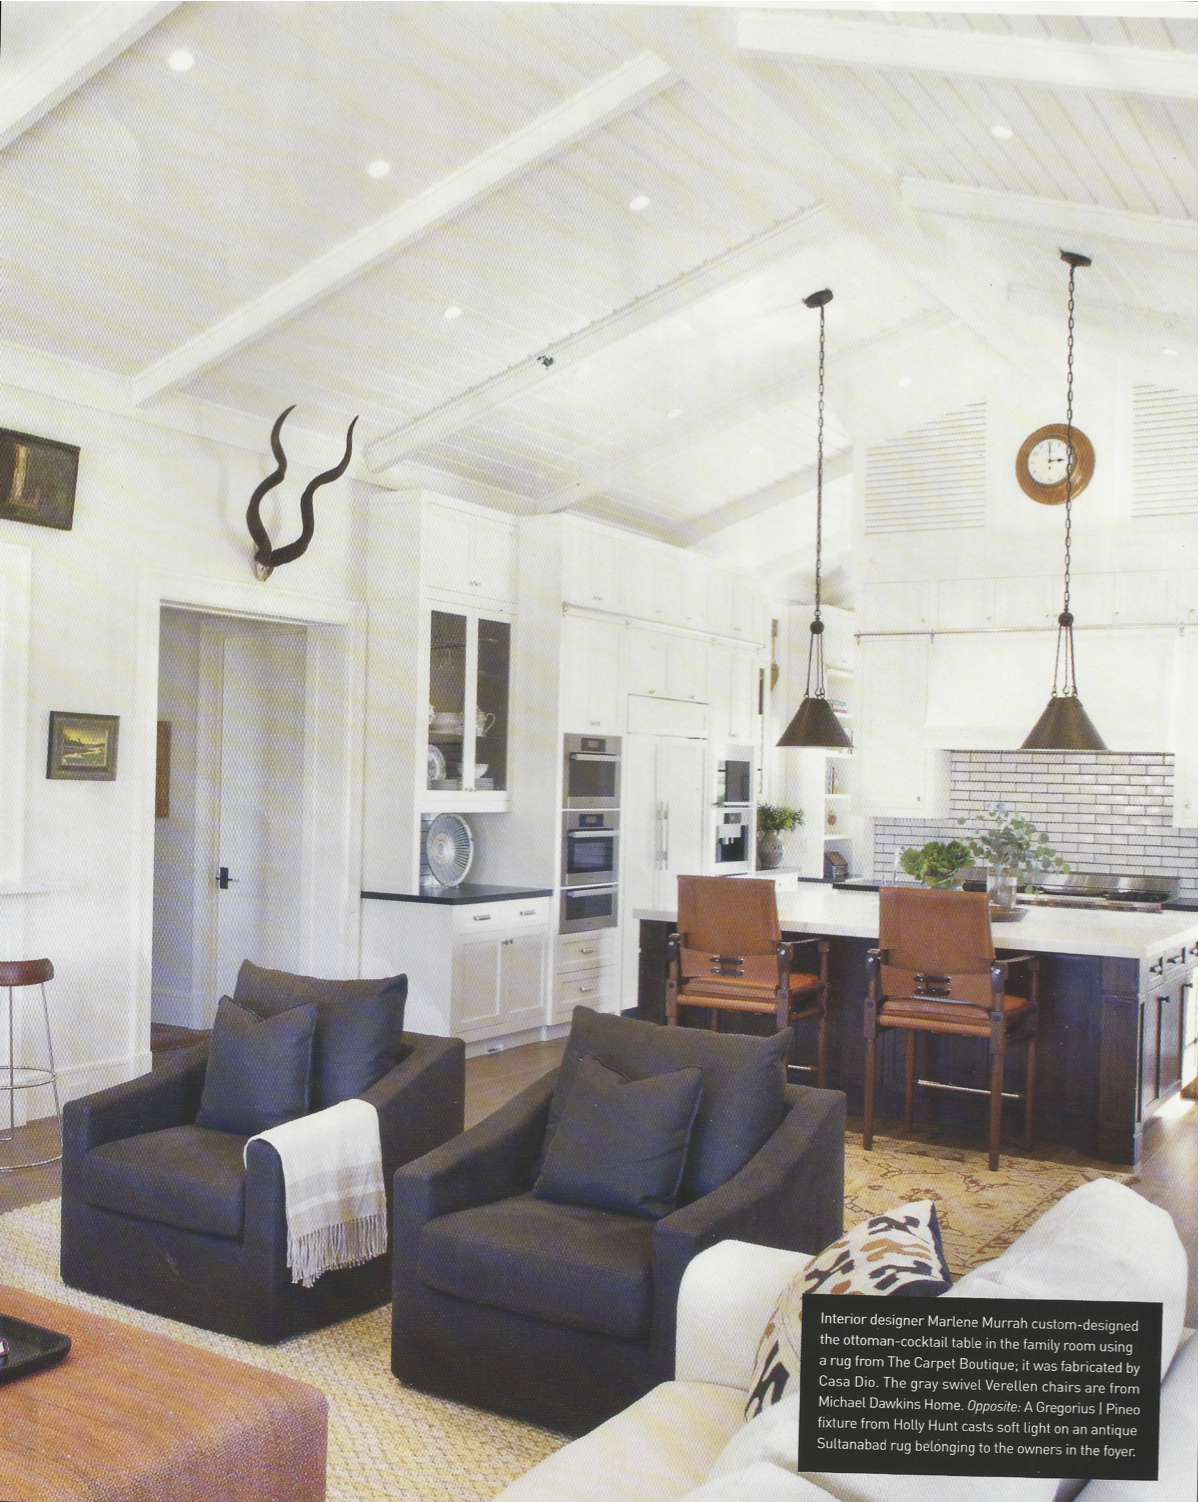 duke club swivel chair verellen luxe interiors magazine